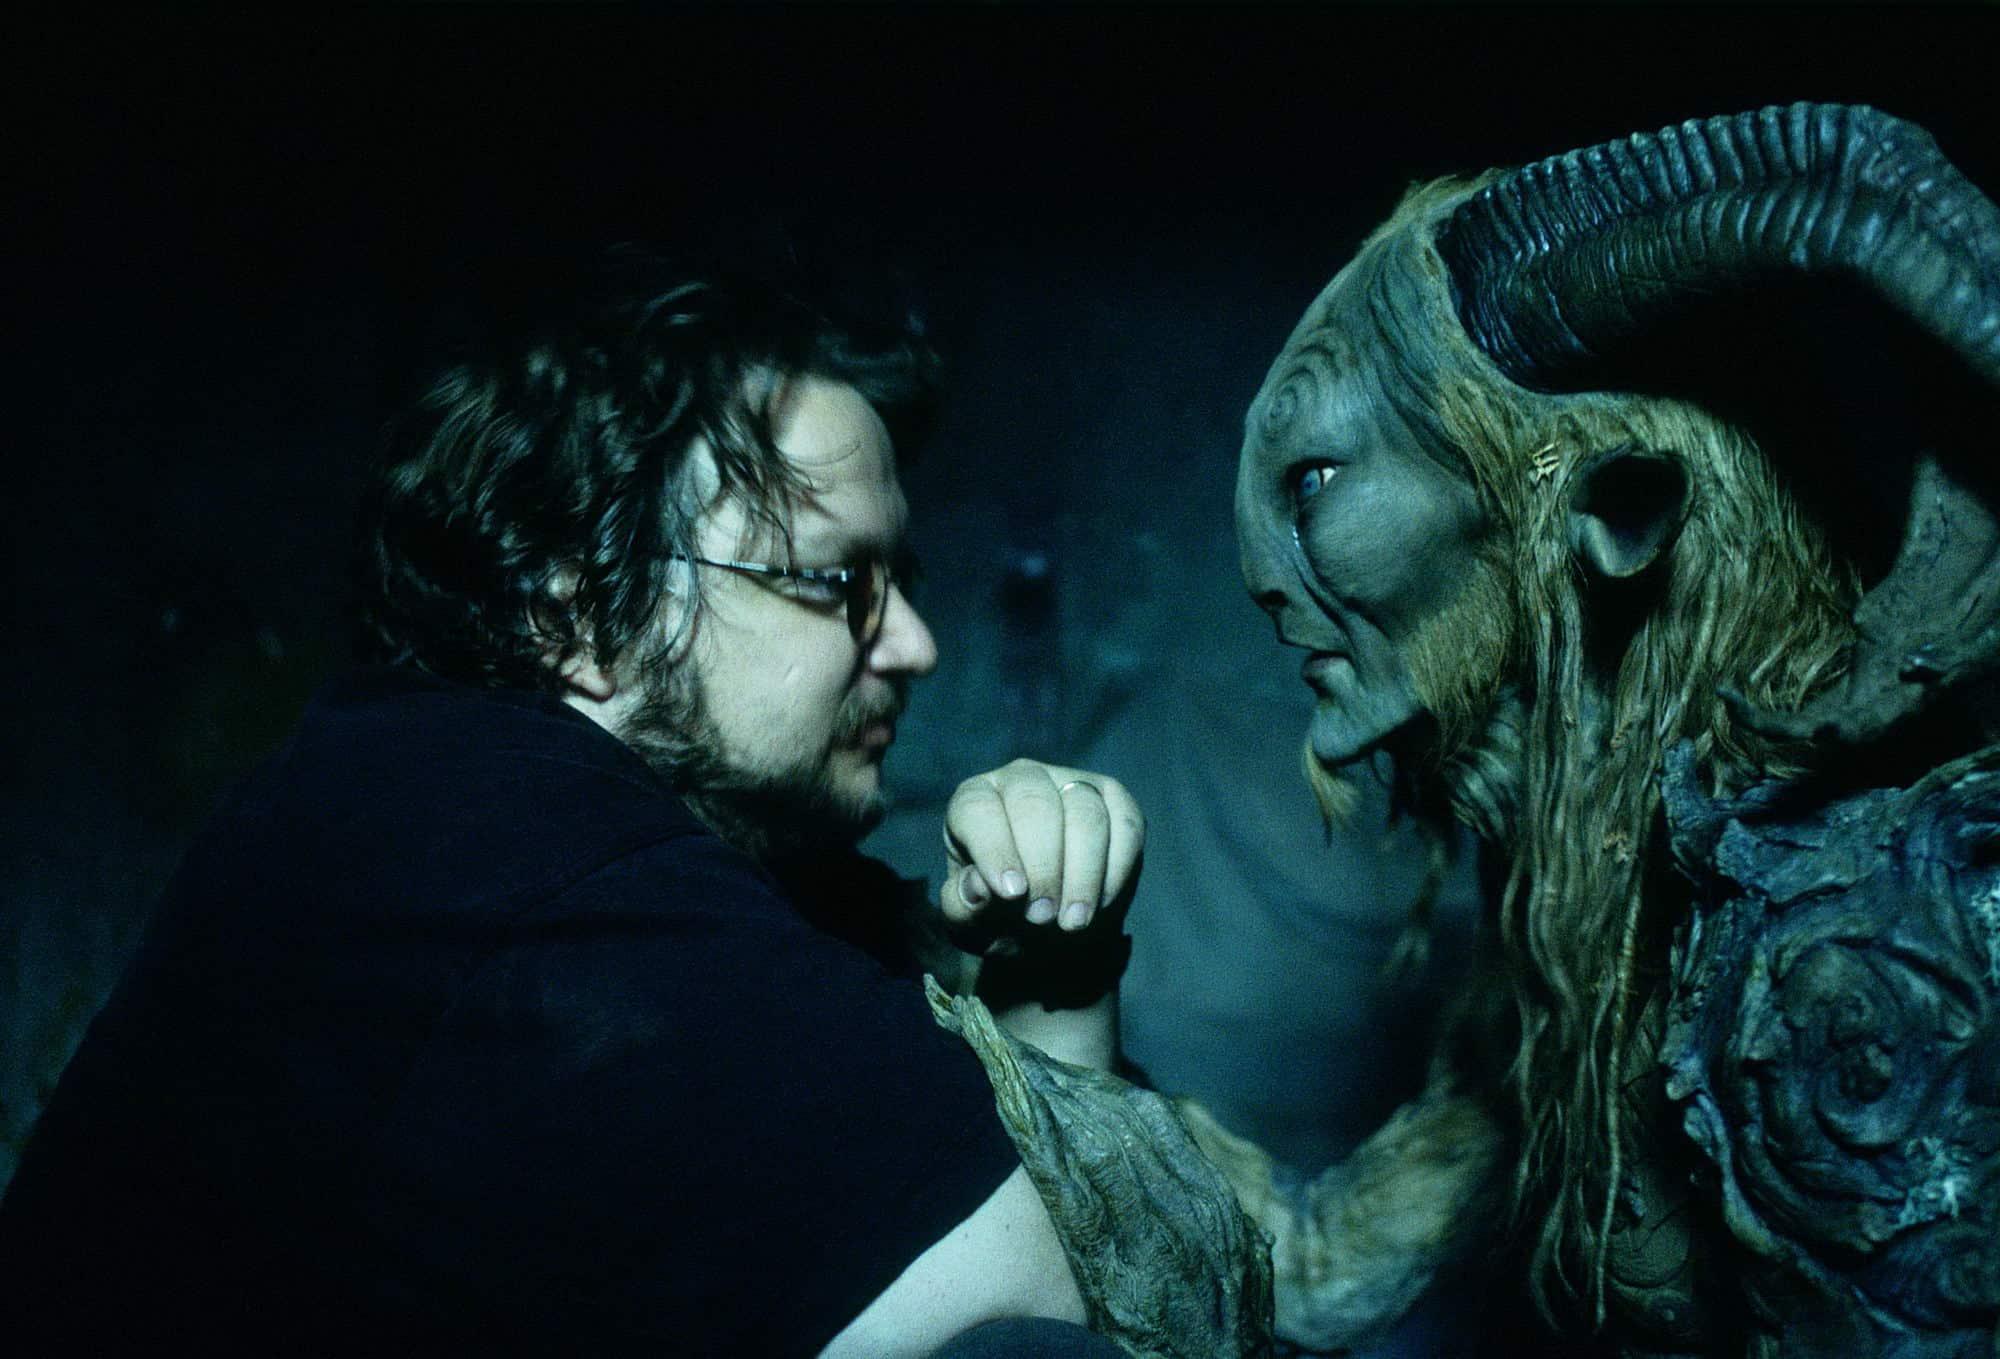 Guillermo del Toro med faunen fra Pans labyrint